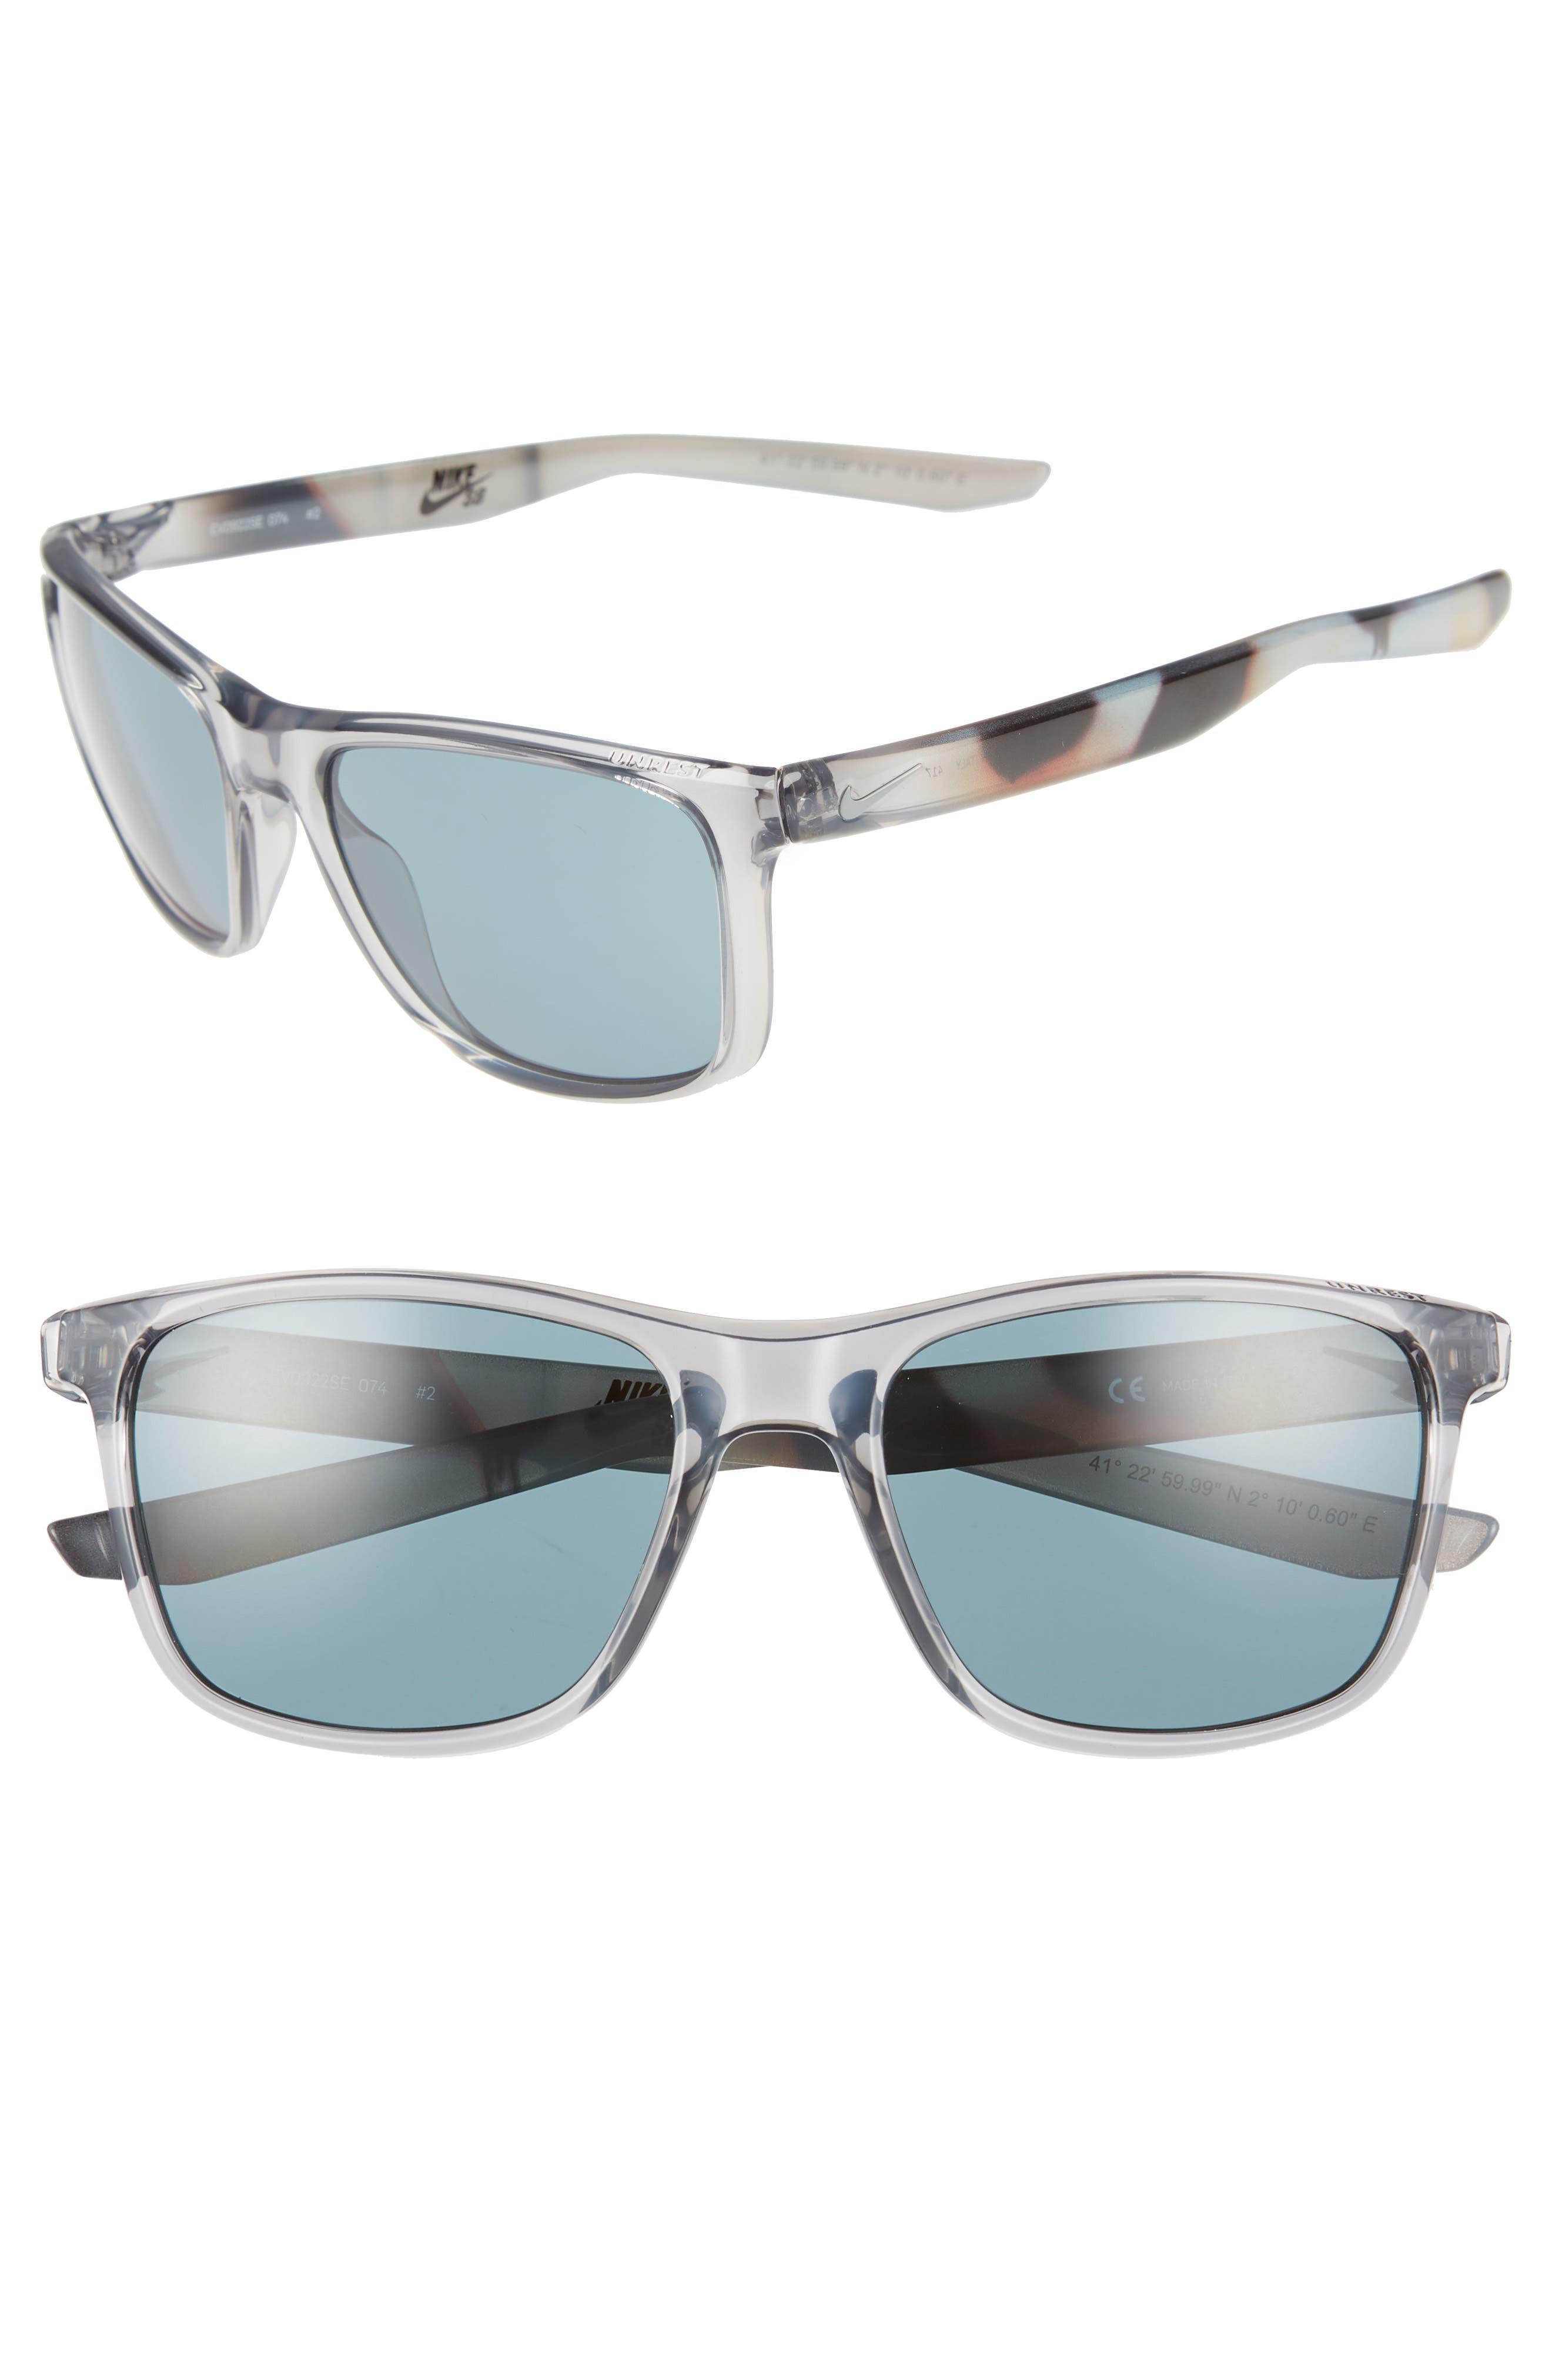 Nike Unrest Se 57Mm Sunglasses - Crystal Grey/ Teal